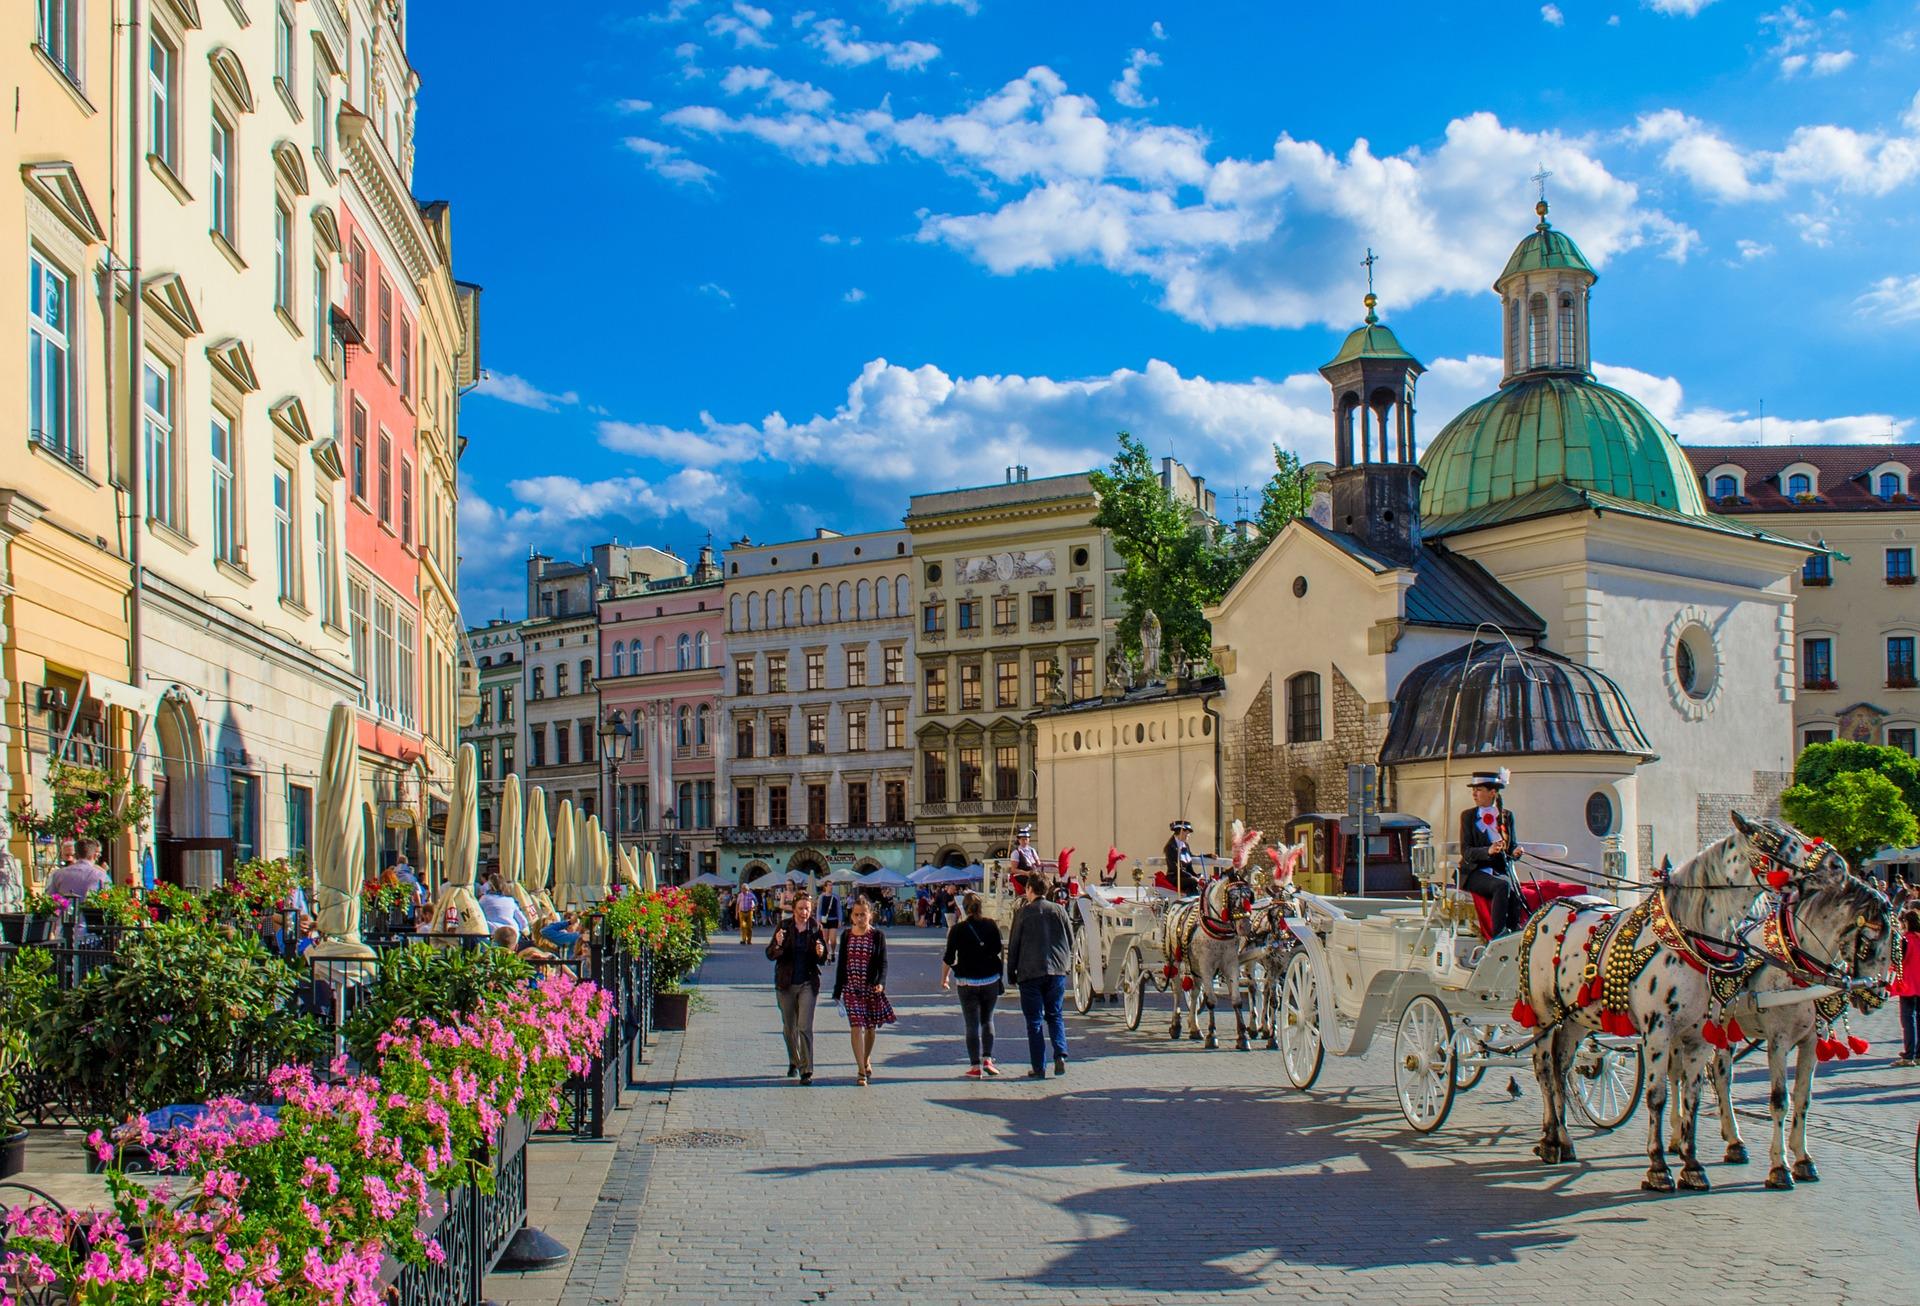 Summer feeling in Krakau, Poland